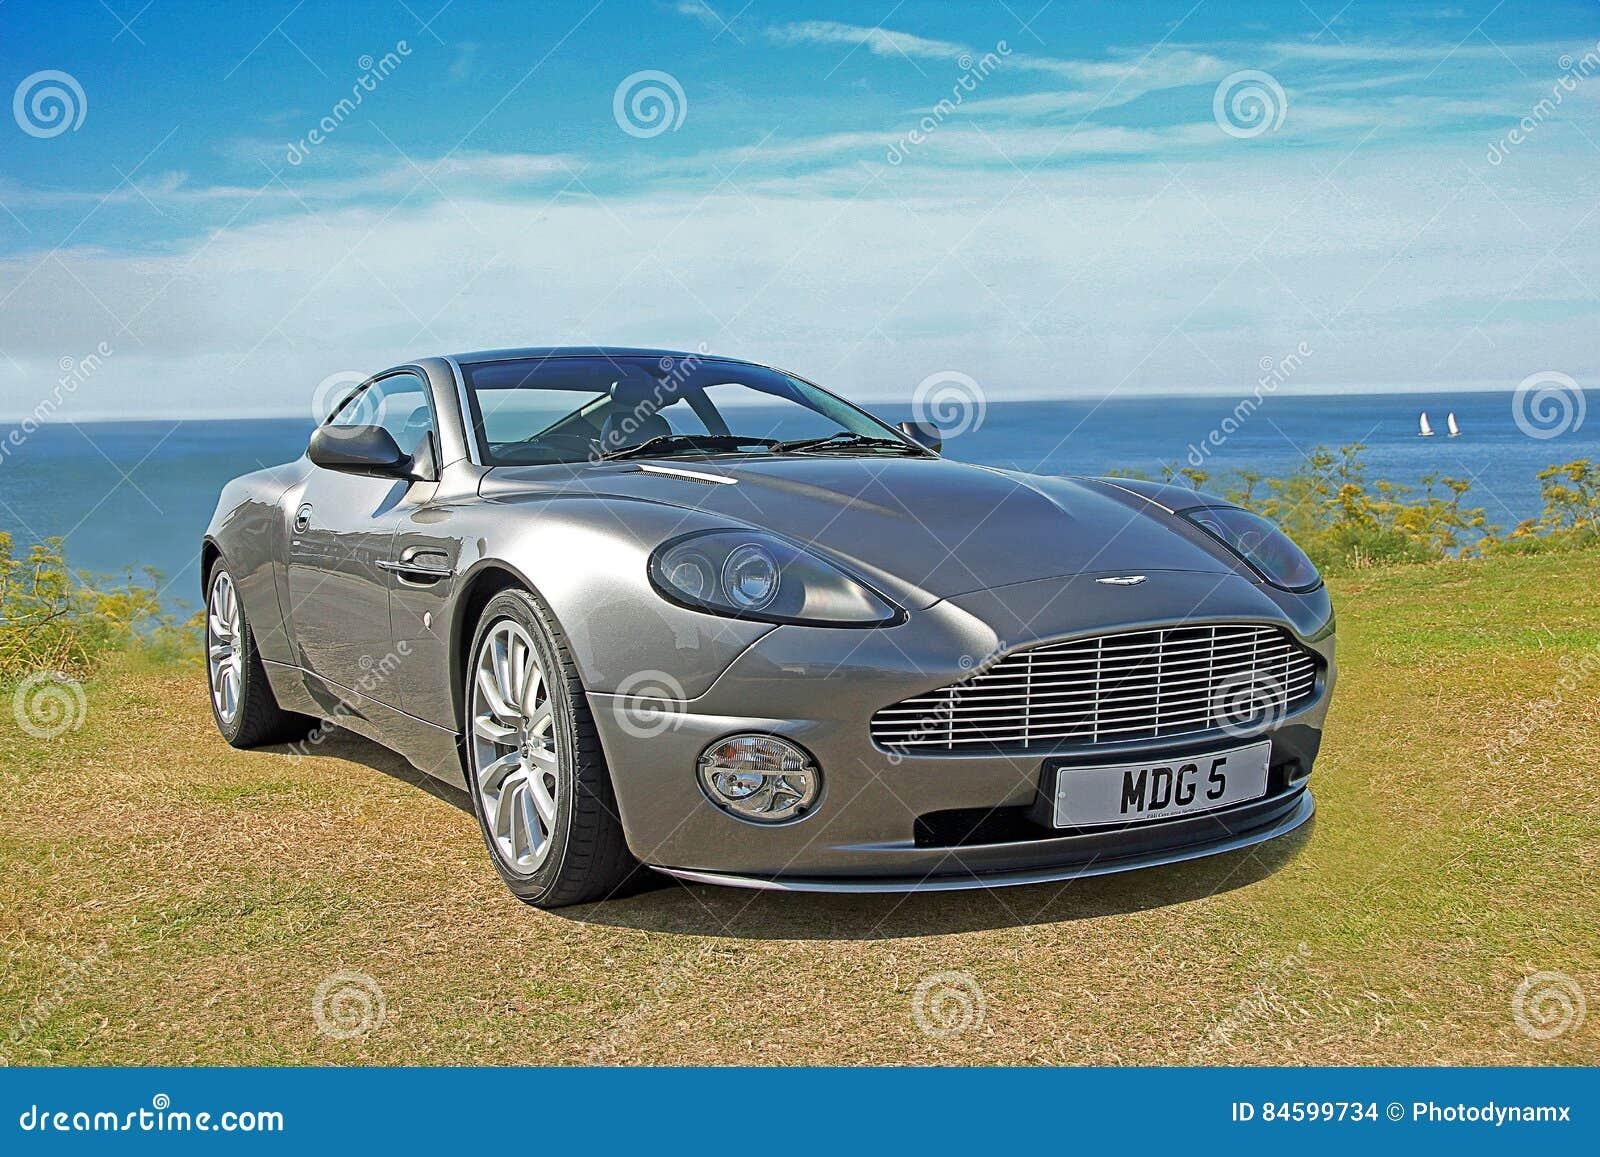 Aston Martin Vanquish Editorial Stock Image Image Of Motors 84599734